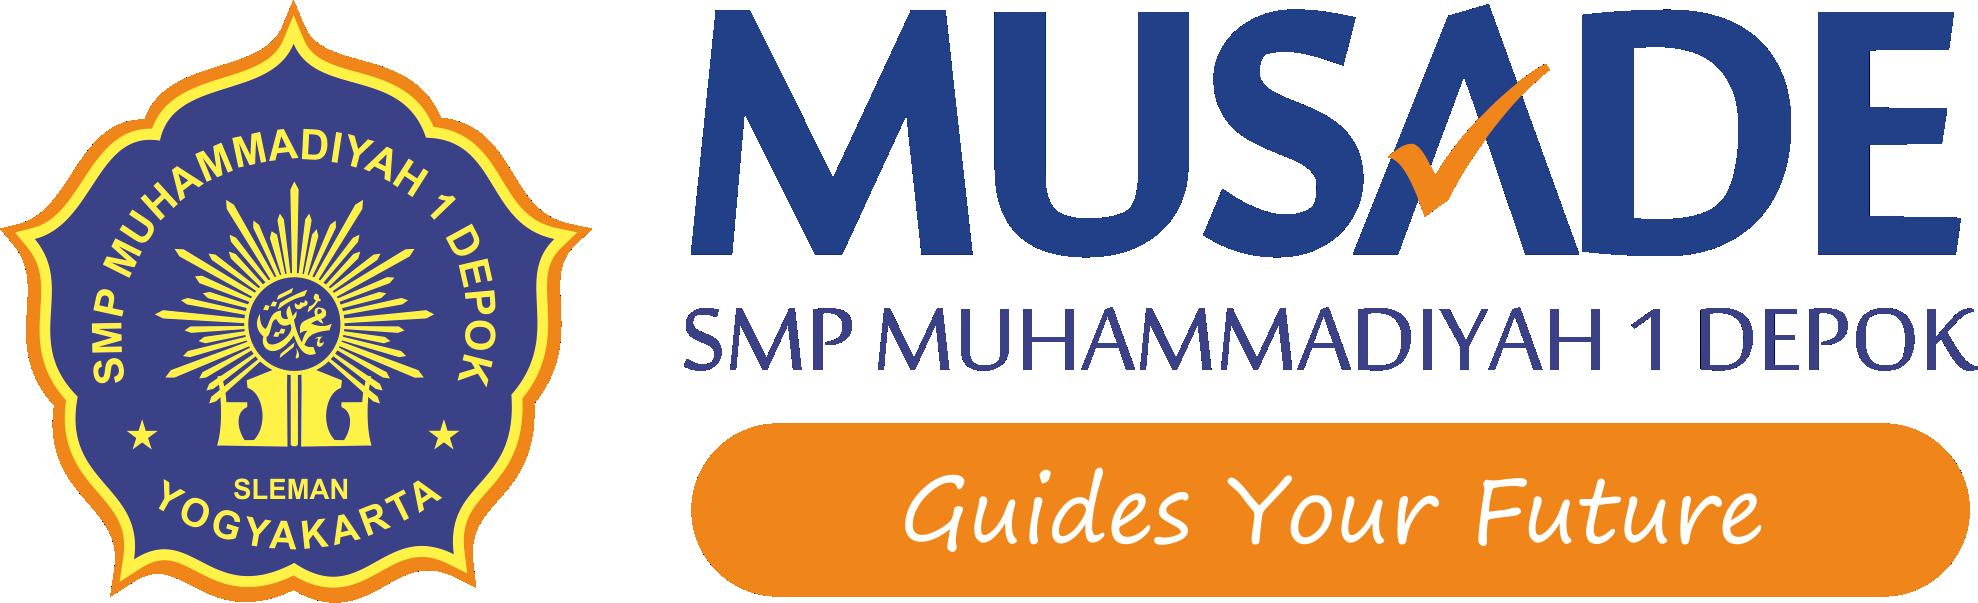 Selamat Datang di SMP Muhammadiyah 1 Depok Sleman